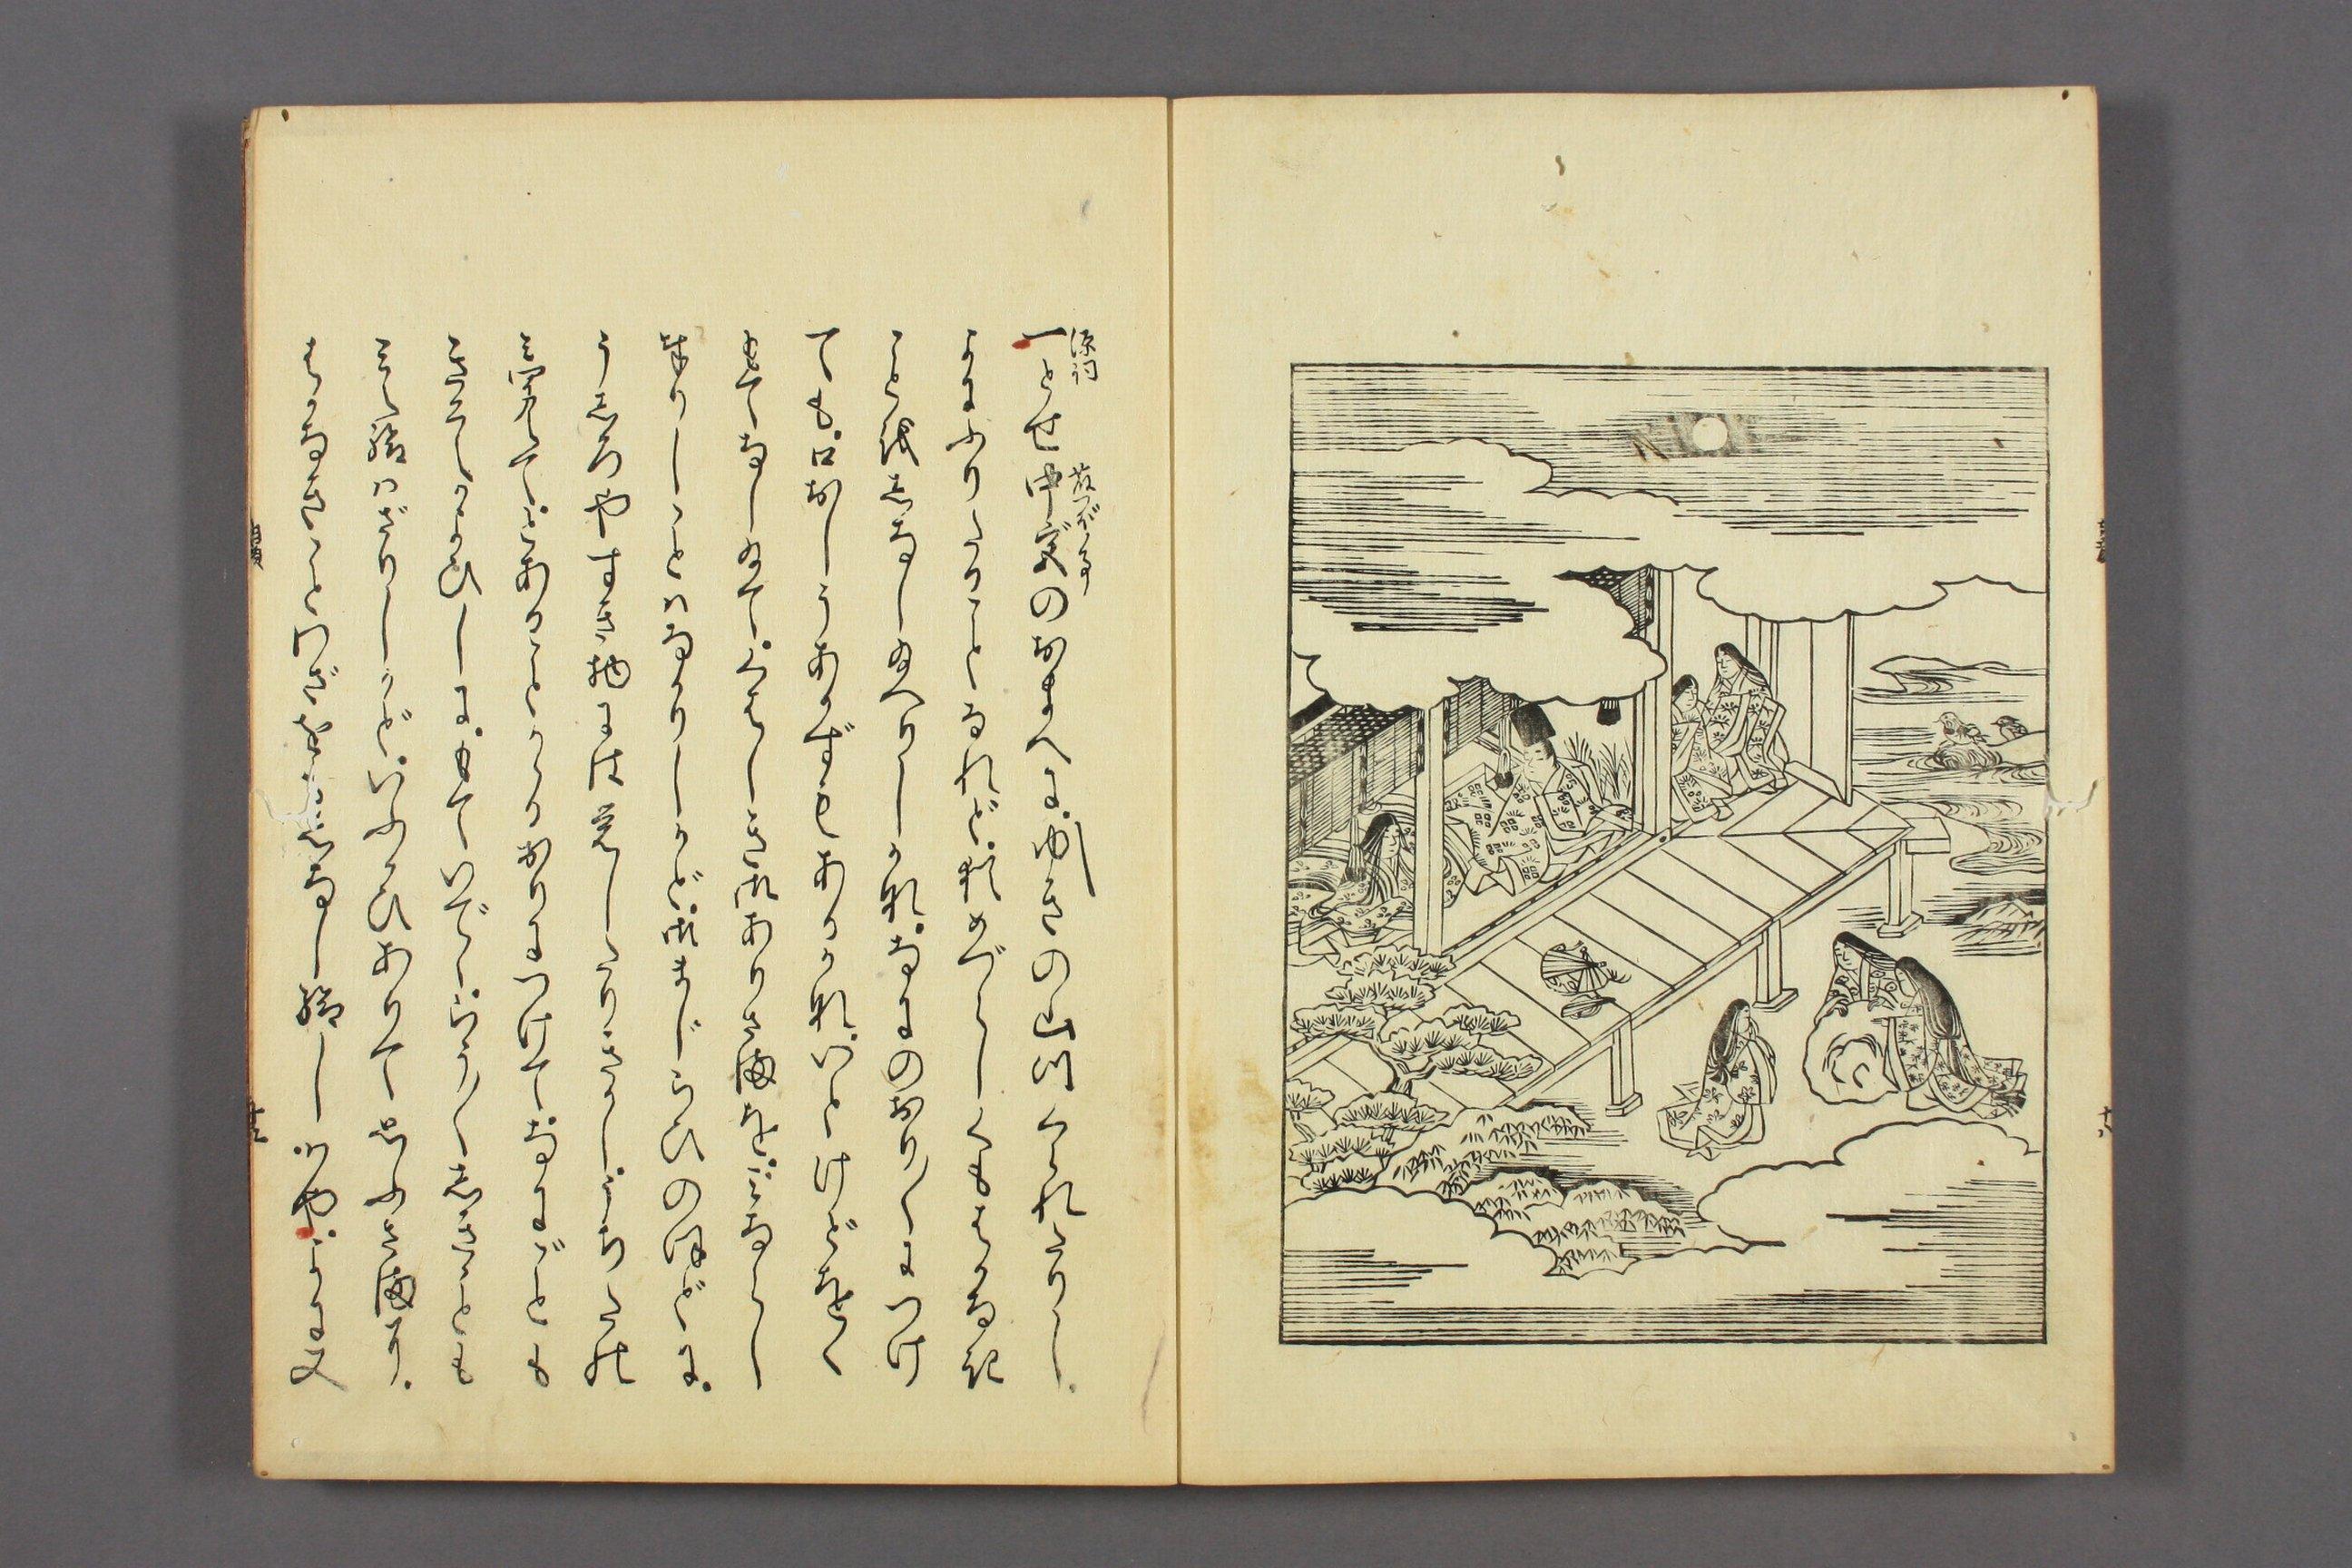 http://archive.wul.waseda.ac.jp/kosho/bunko30/bunko30_a0007/bunko30_a0007_0020/bunko30_a0007_0020_p0020.jpg